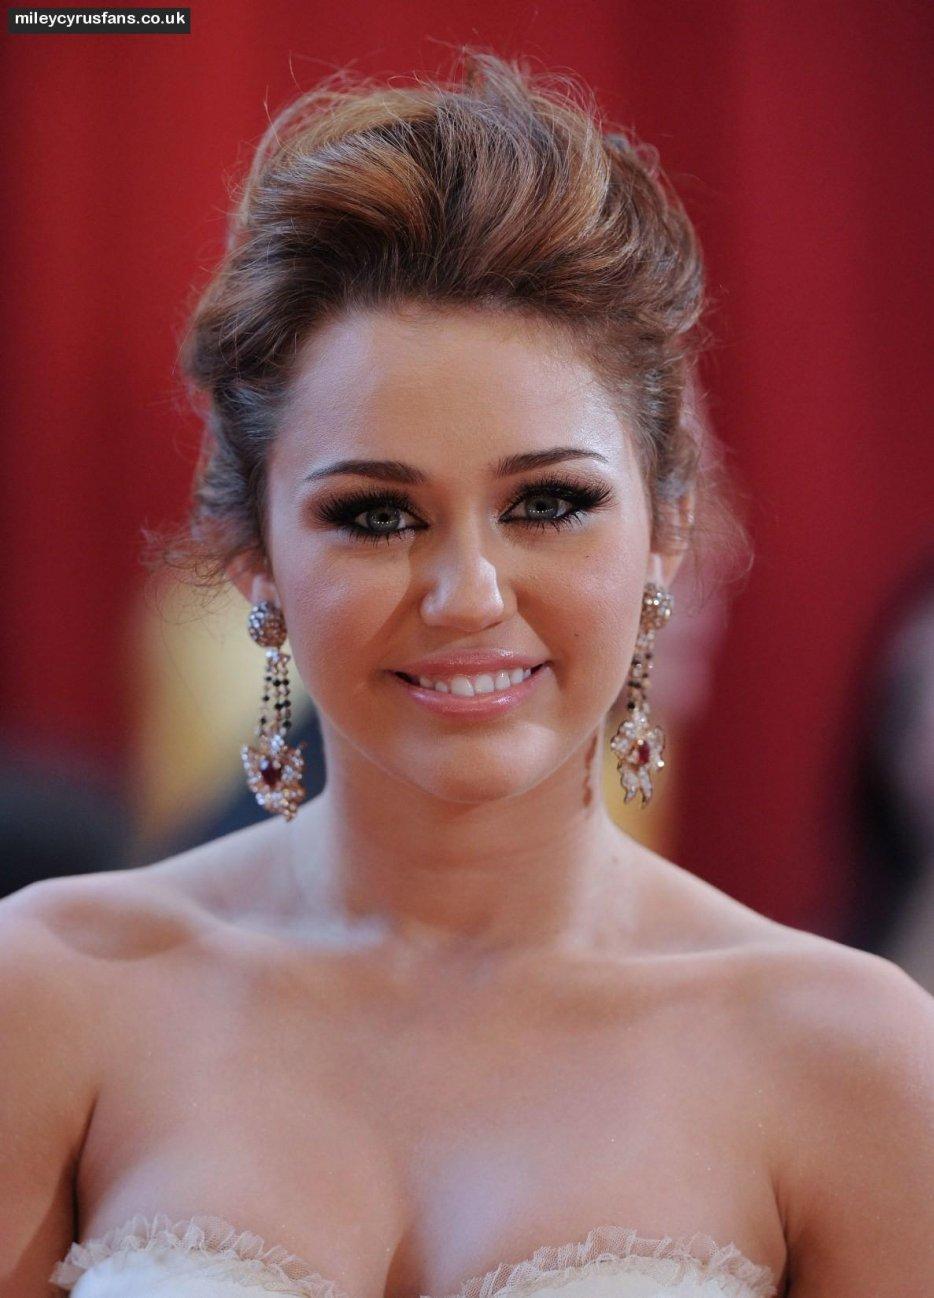 Stars Hd Miley Cyrus New Hair 2012